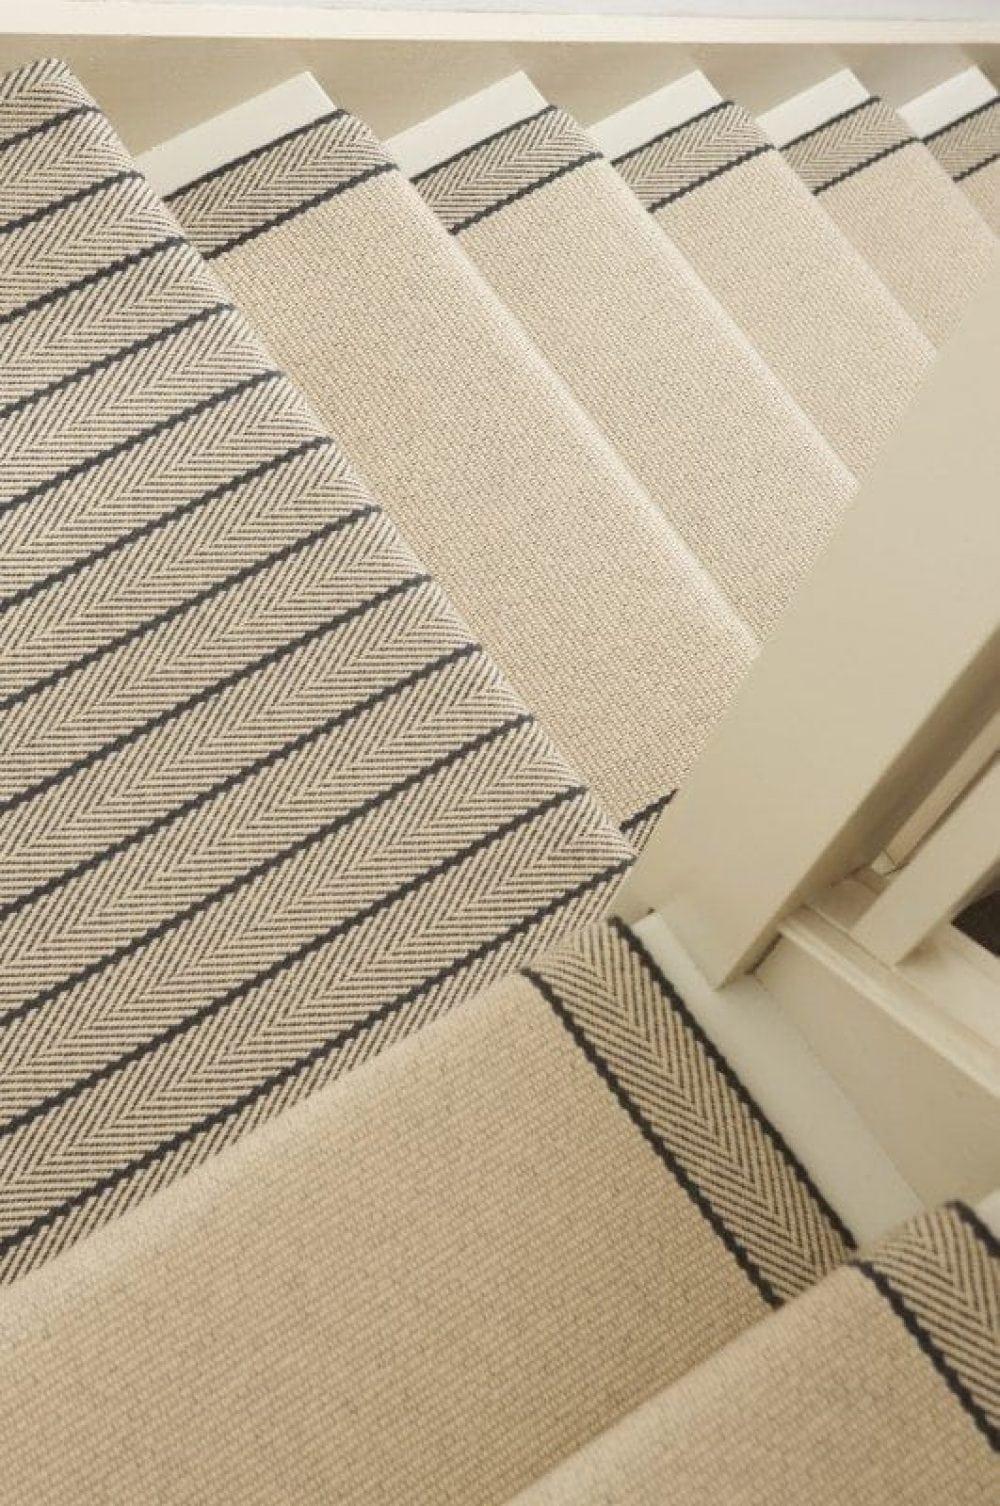 Roger Oates Carpets